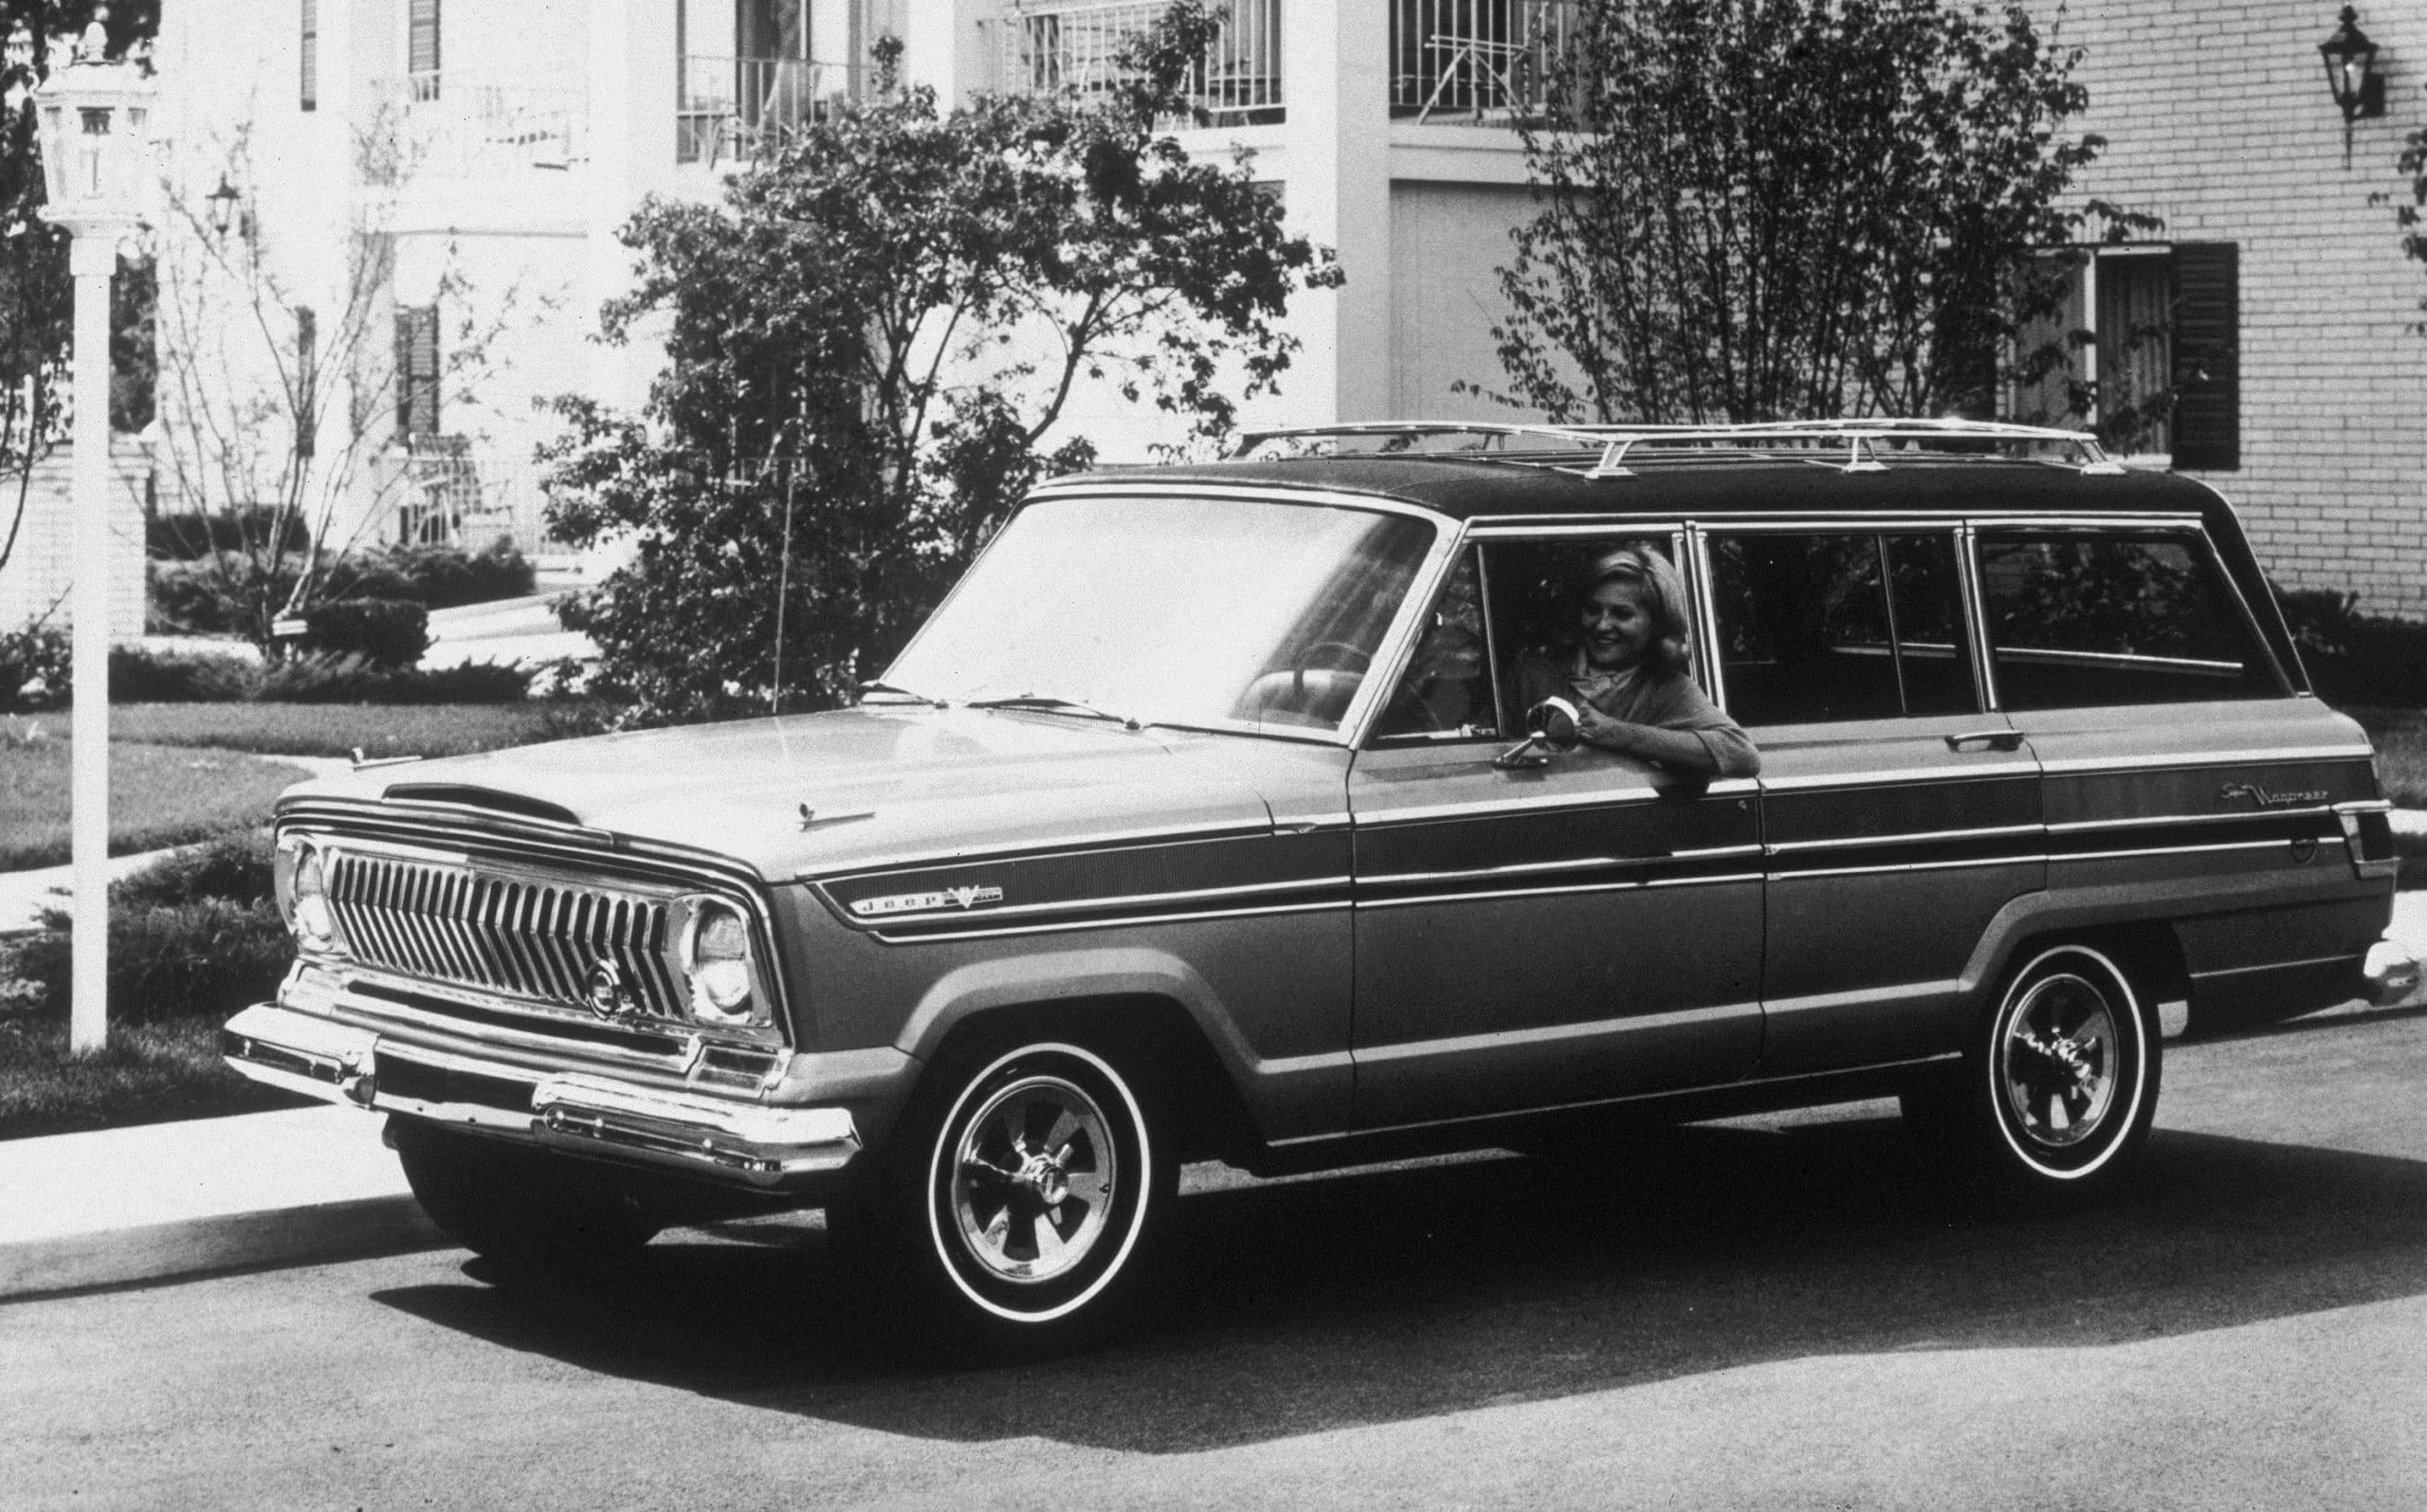 01 8th moment 1963 Jeep Wagoneer scaled 12 ορόσημα, για τα 80α γενέθλια της Jeep Jeep, Jeep Cherokee, Jeep Compass, Jeep Gladiator, Jeep Grand Cherokee, Jeep Renegade, Jeep Willys, Jeep Wrangler, ειδήσεις, Νέα